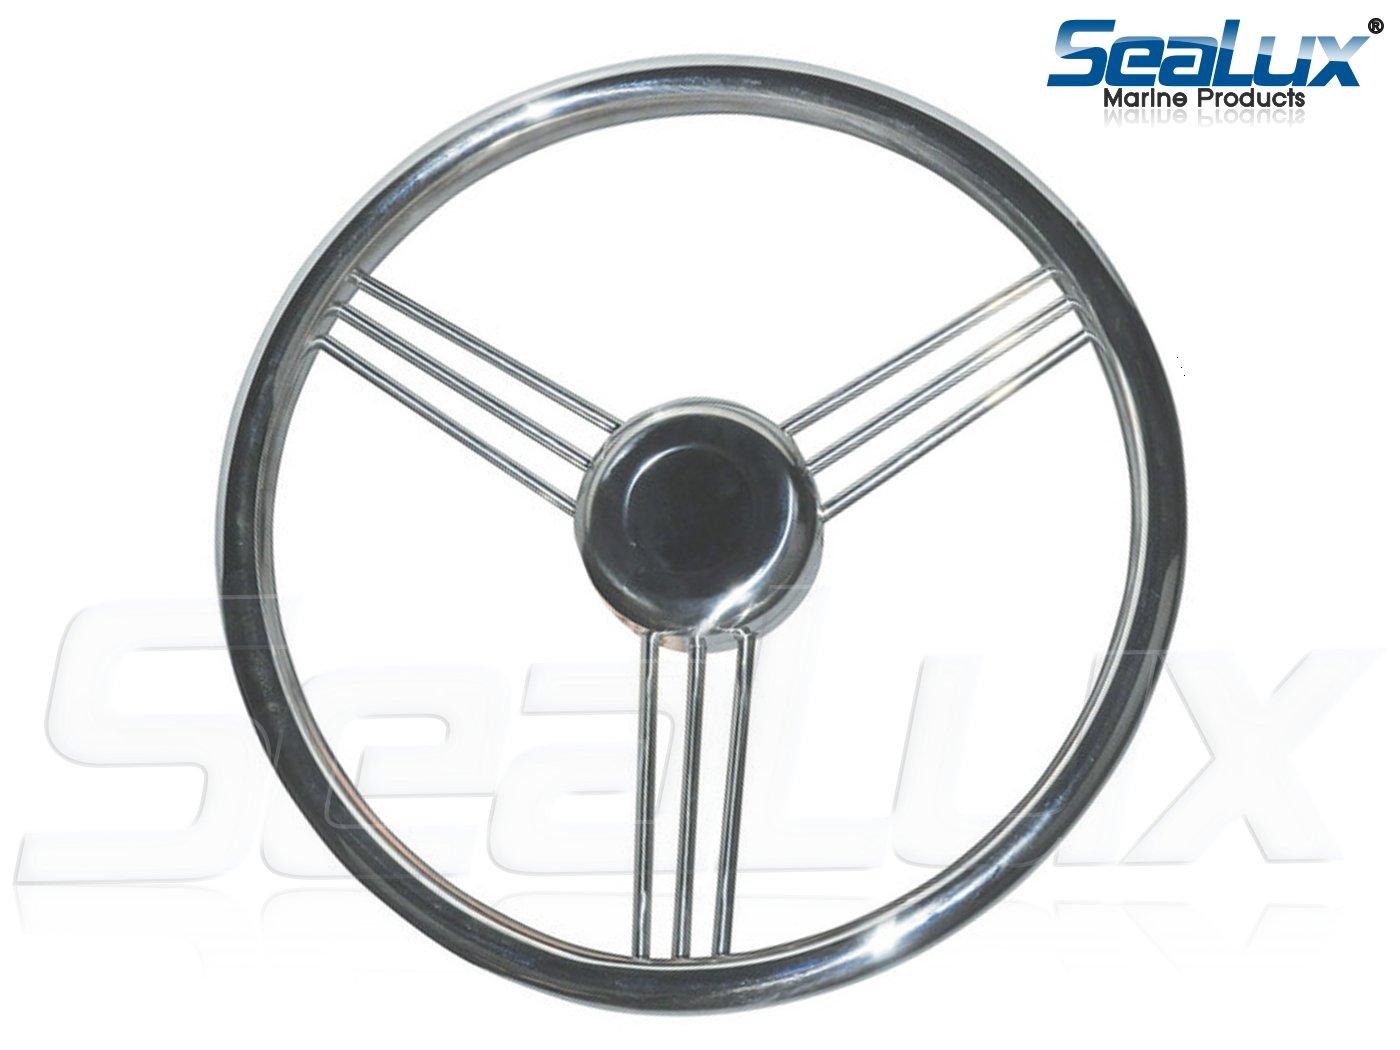 SeaLux 9 Spokes Stainless Steel Marine Boat Steering Wheel 13-1/2'', 15 degree dish